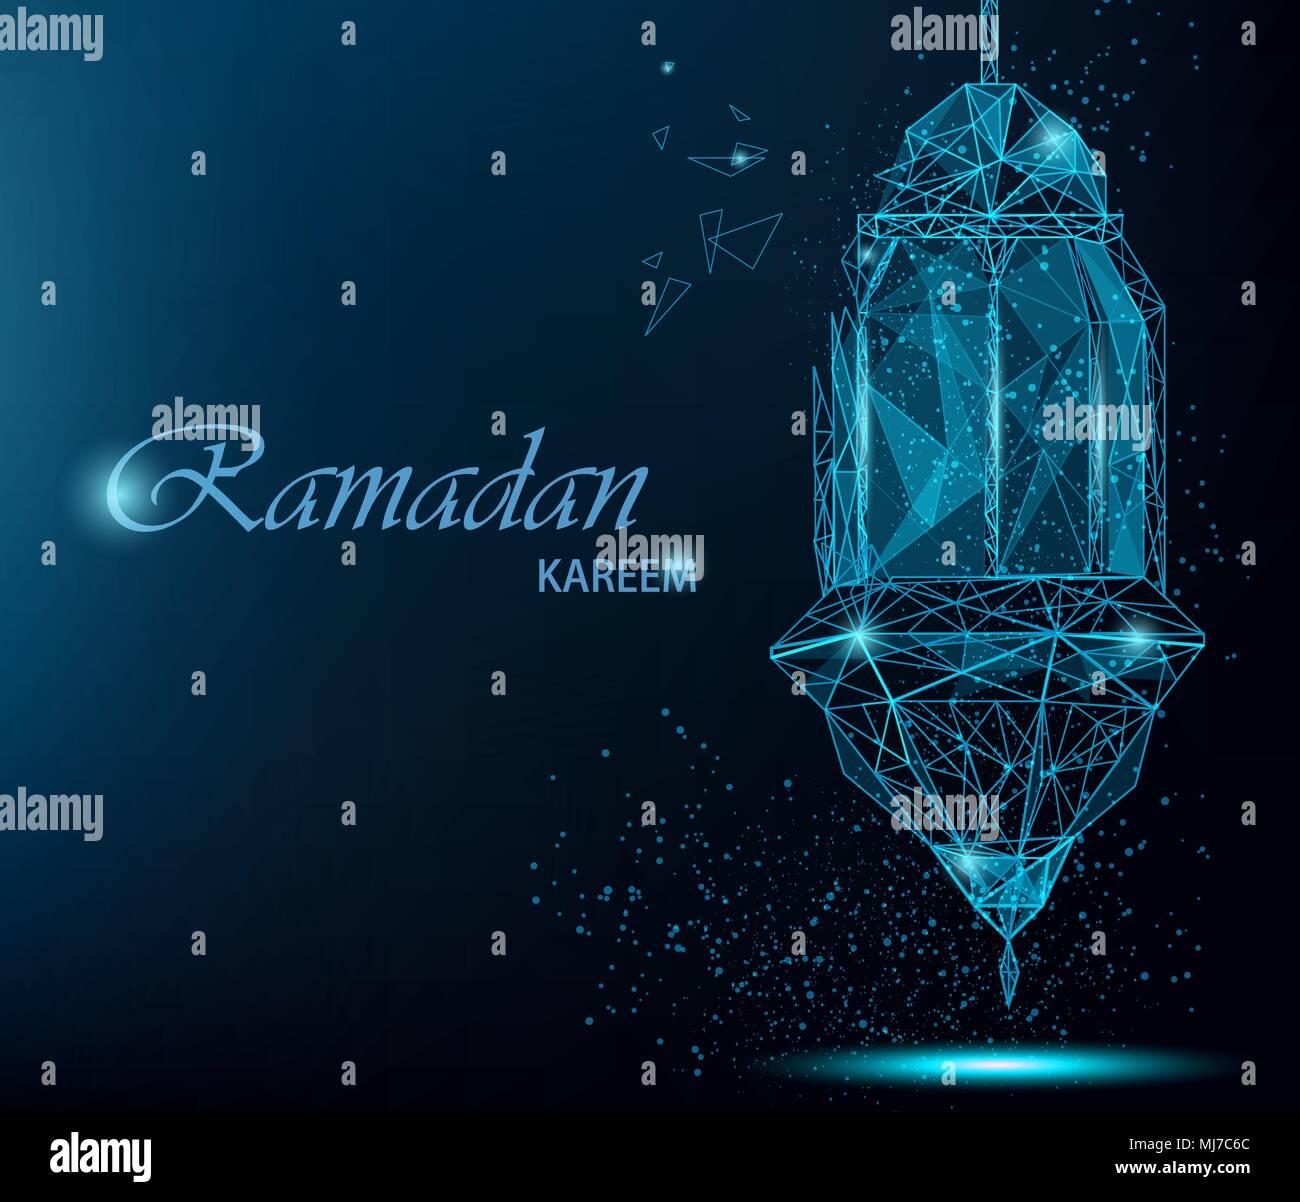 Ramadan kareem bright greeting card with traditional arabic lantern ramadan kareem bright greeting card with traditional arabic lantern polygonal art on blue background usable for eid mubarak stock vector illustrati m4hsunfo